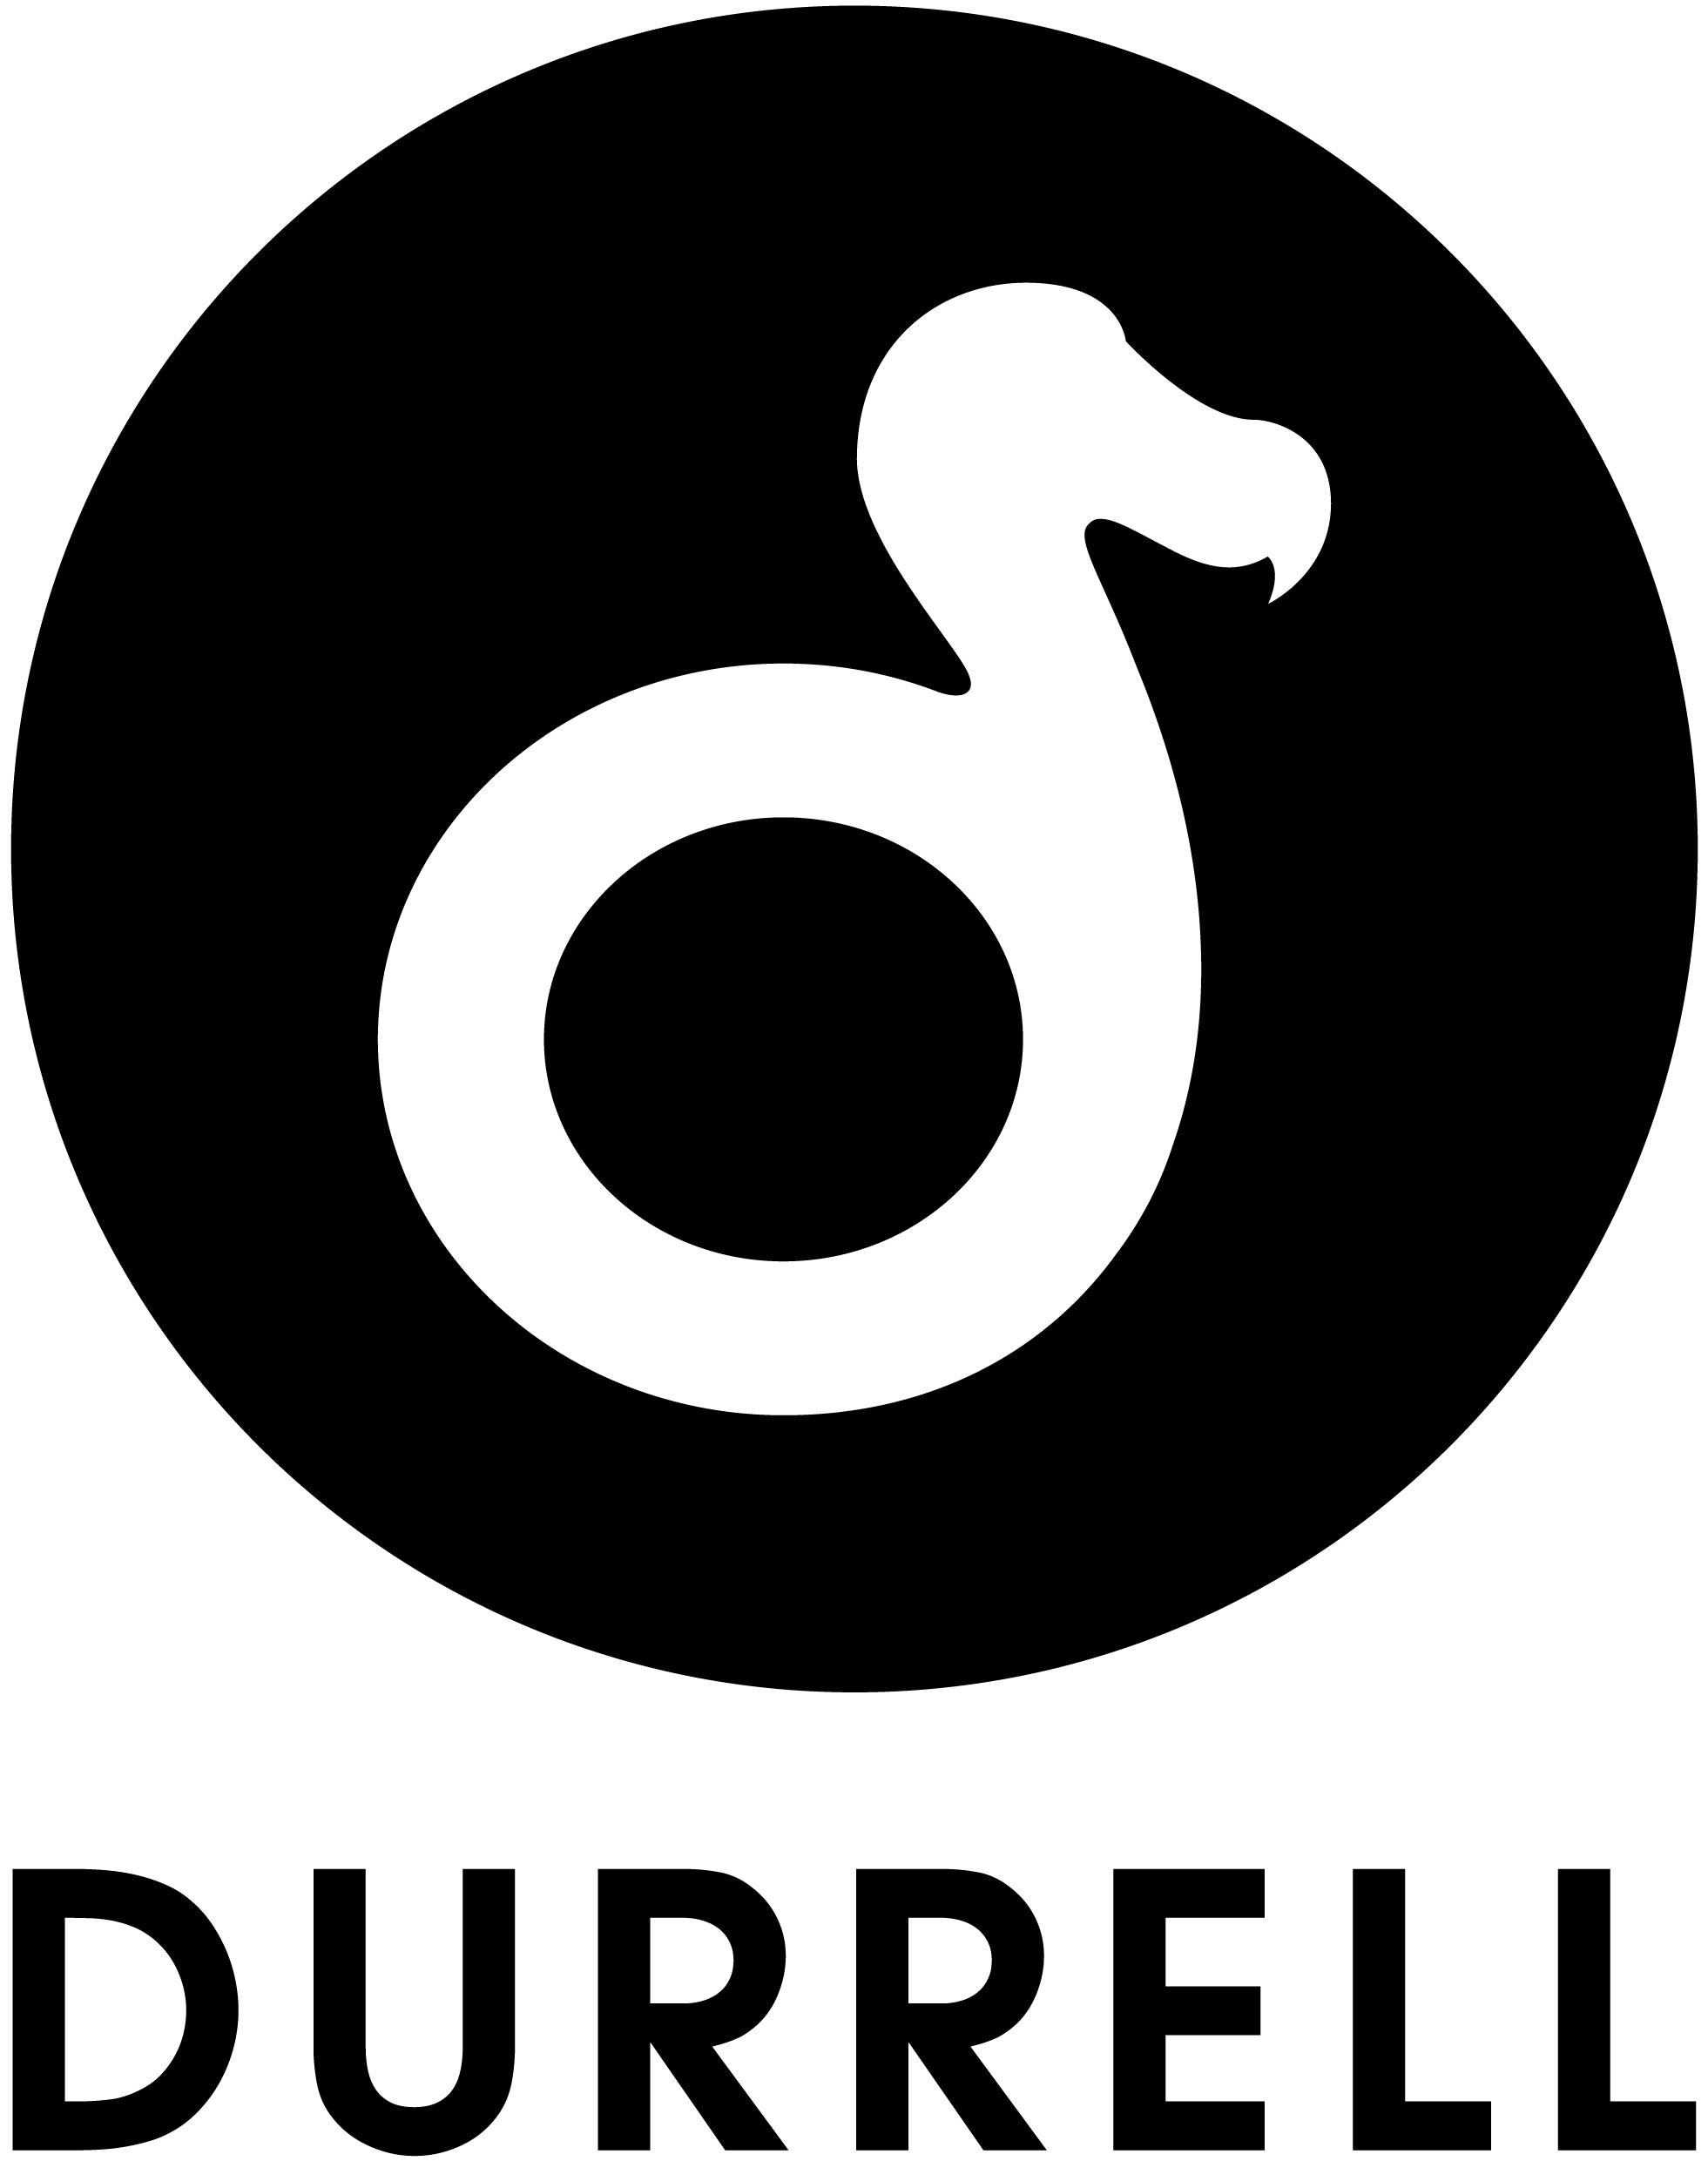 durrell logo black 2017 REV.jpg